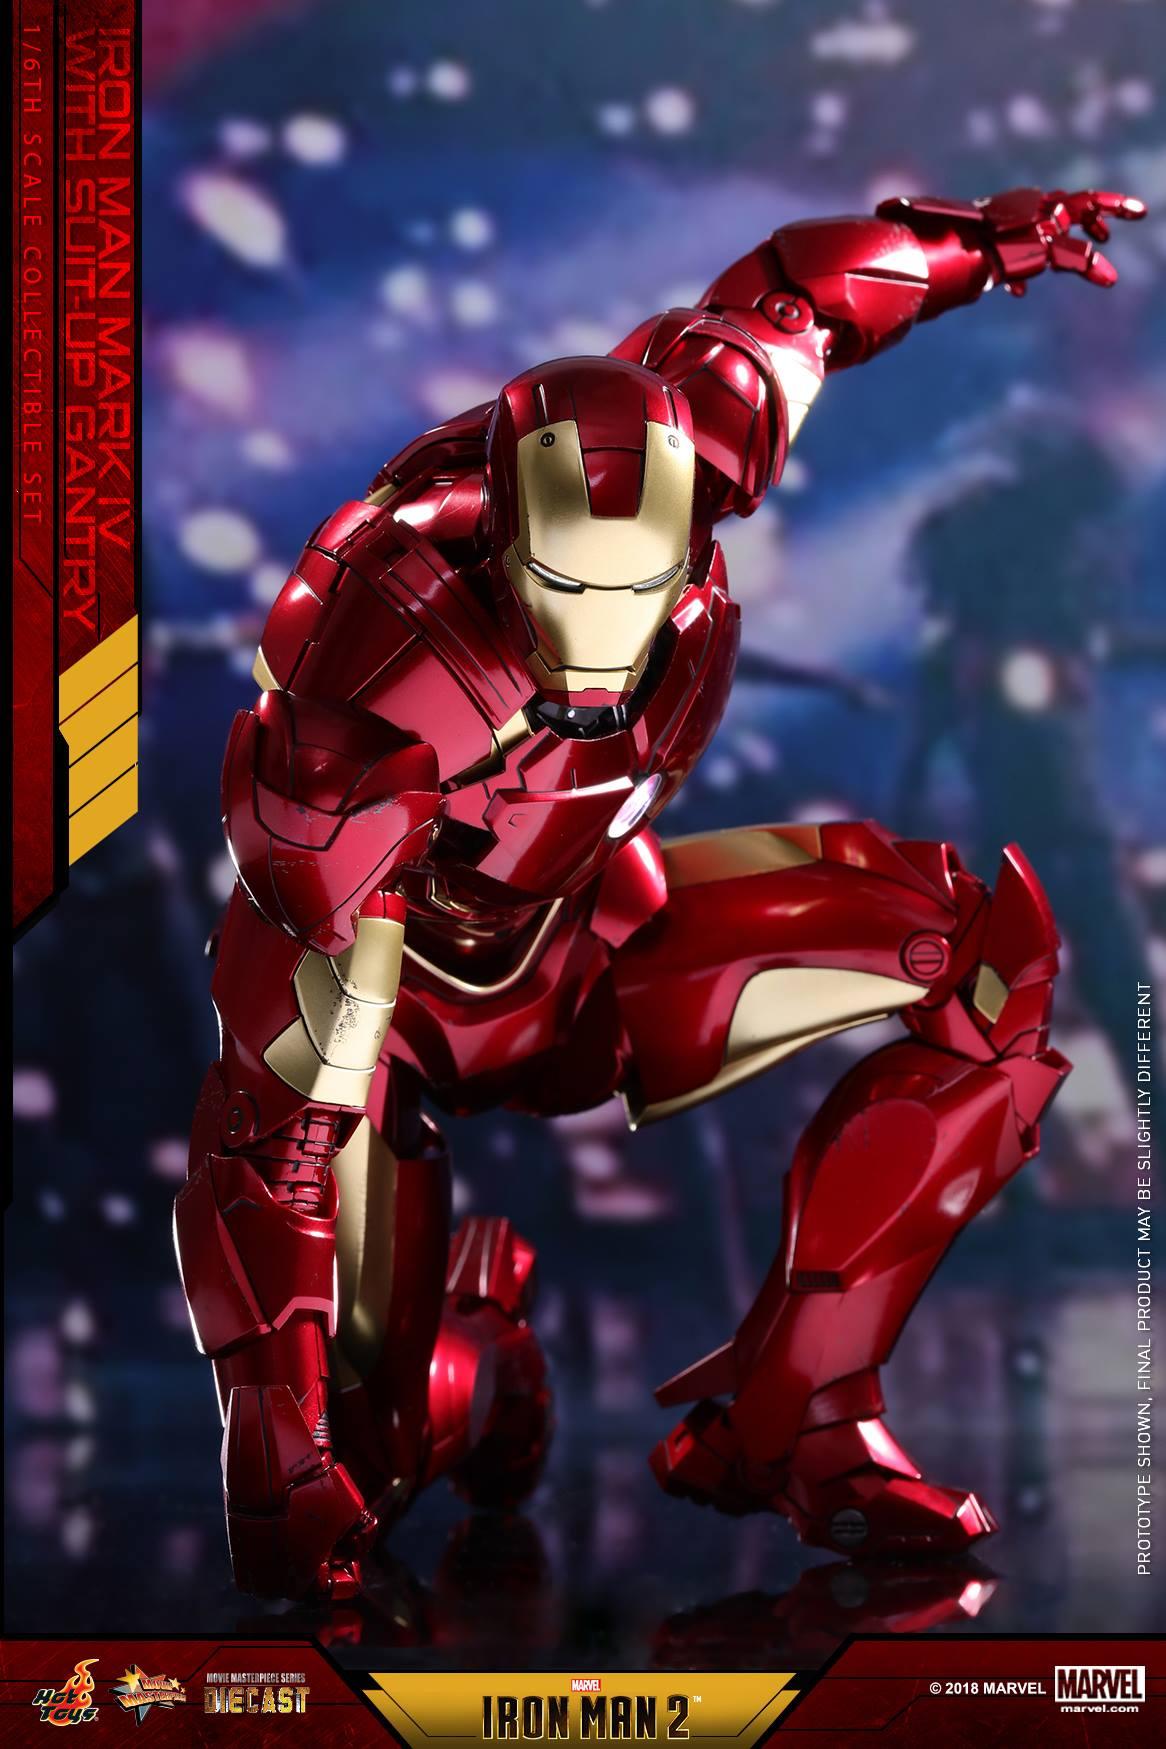 Hot-Toys-Iron-Man-MKIV-with-Gantry-024